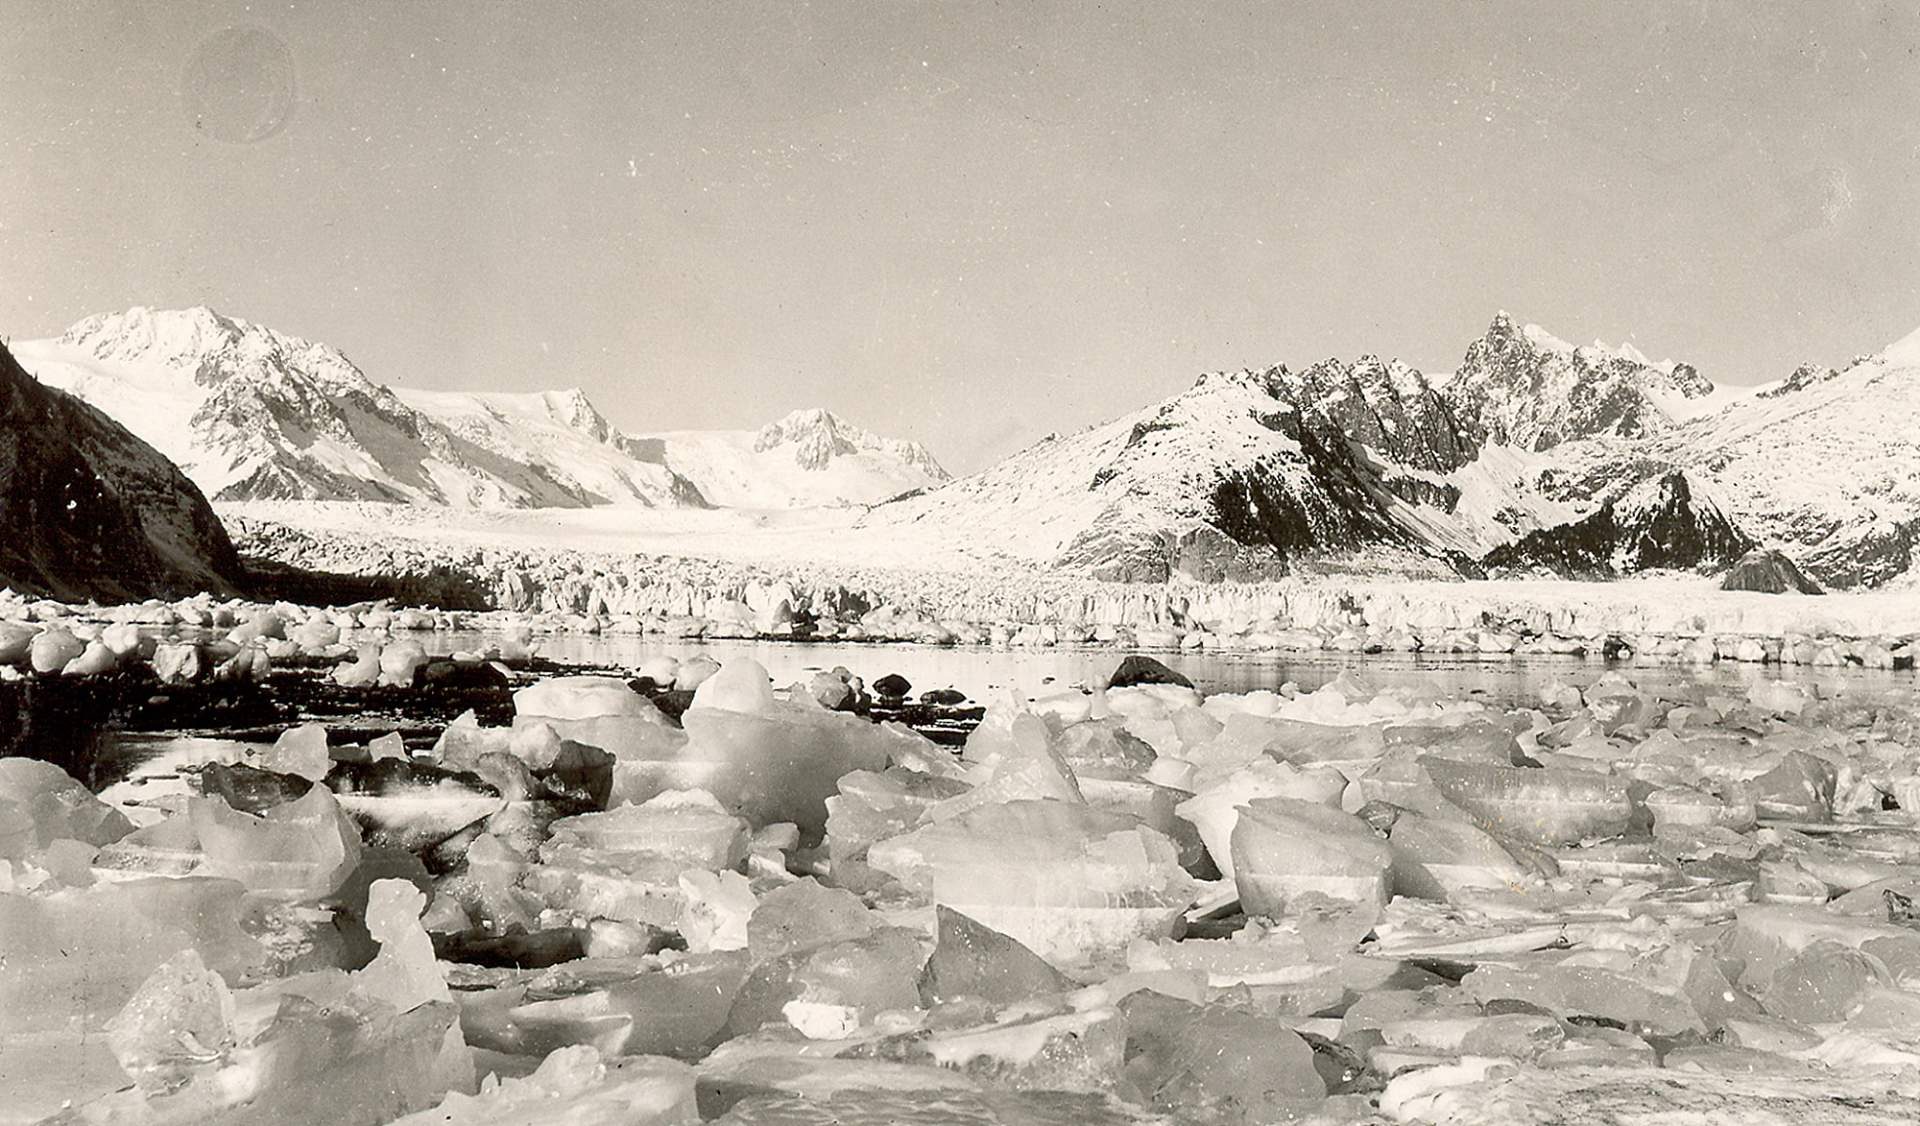 Bruce Molnia Glacier Photos Northwestern Glacier View3 1940